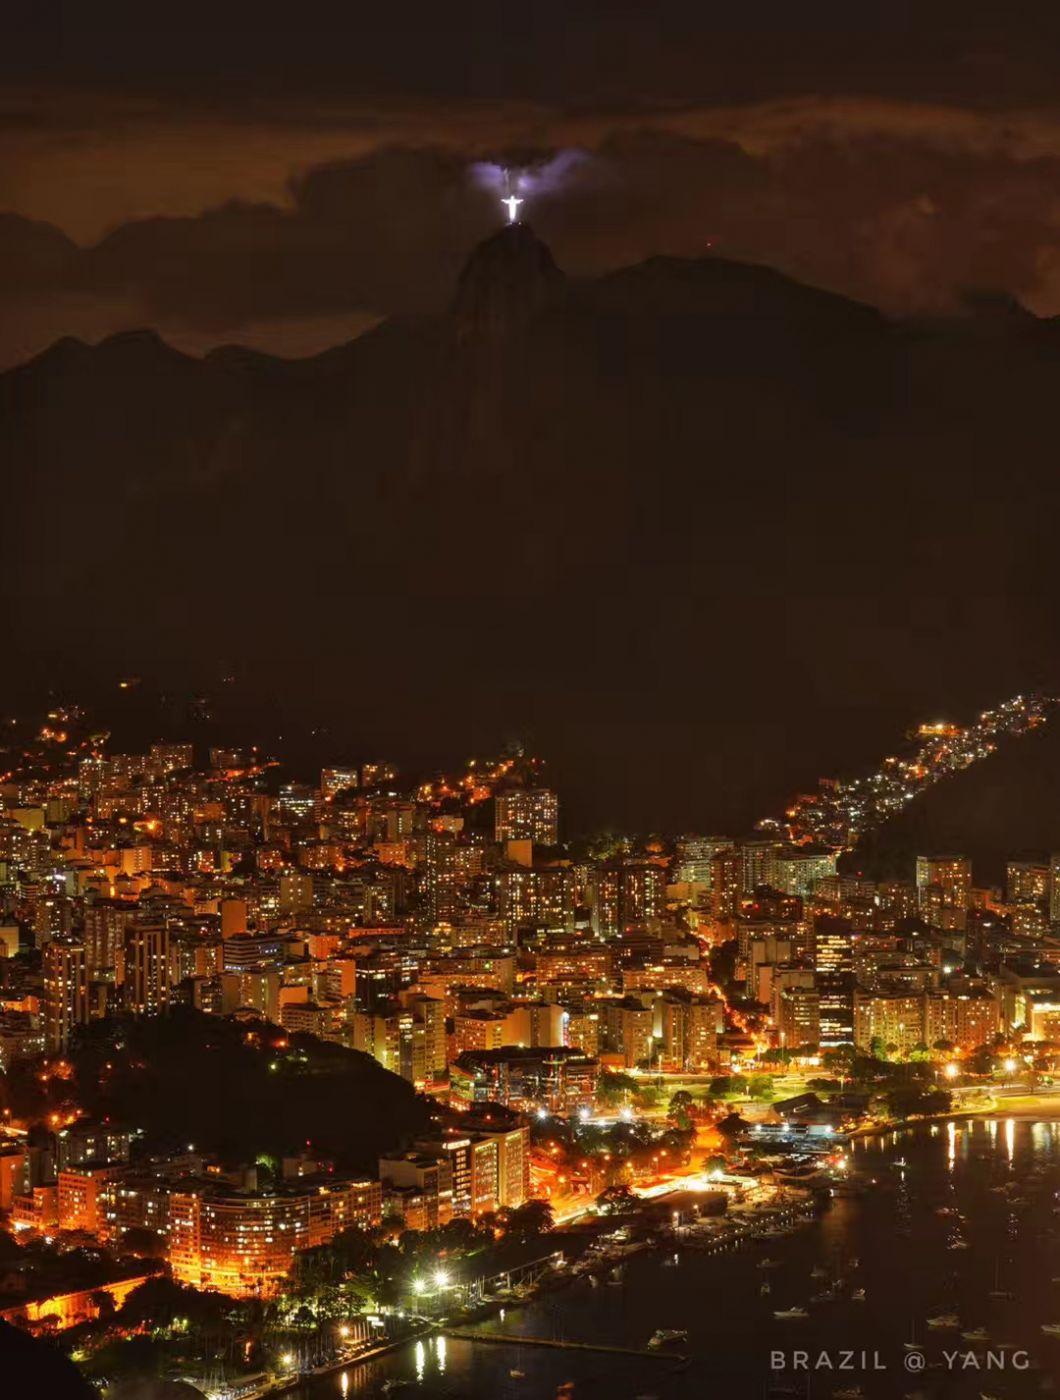 sugar loaf mountain, Brazil